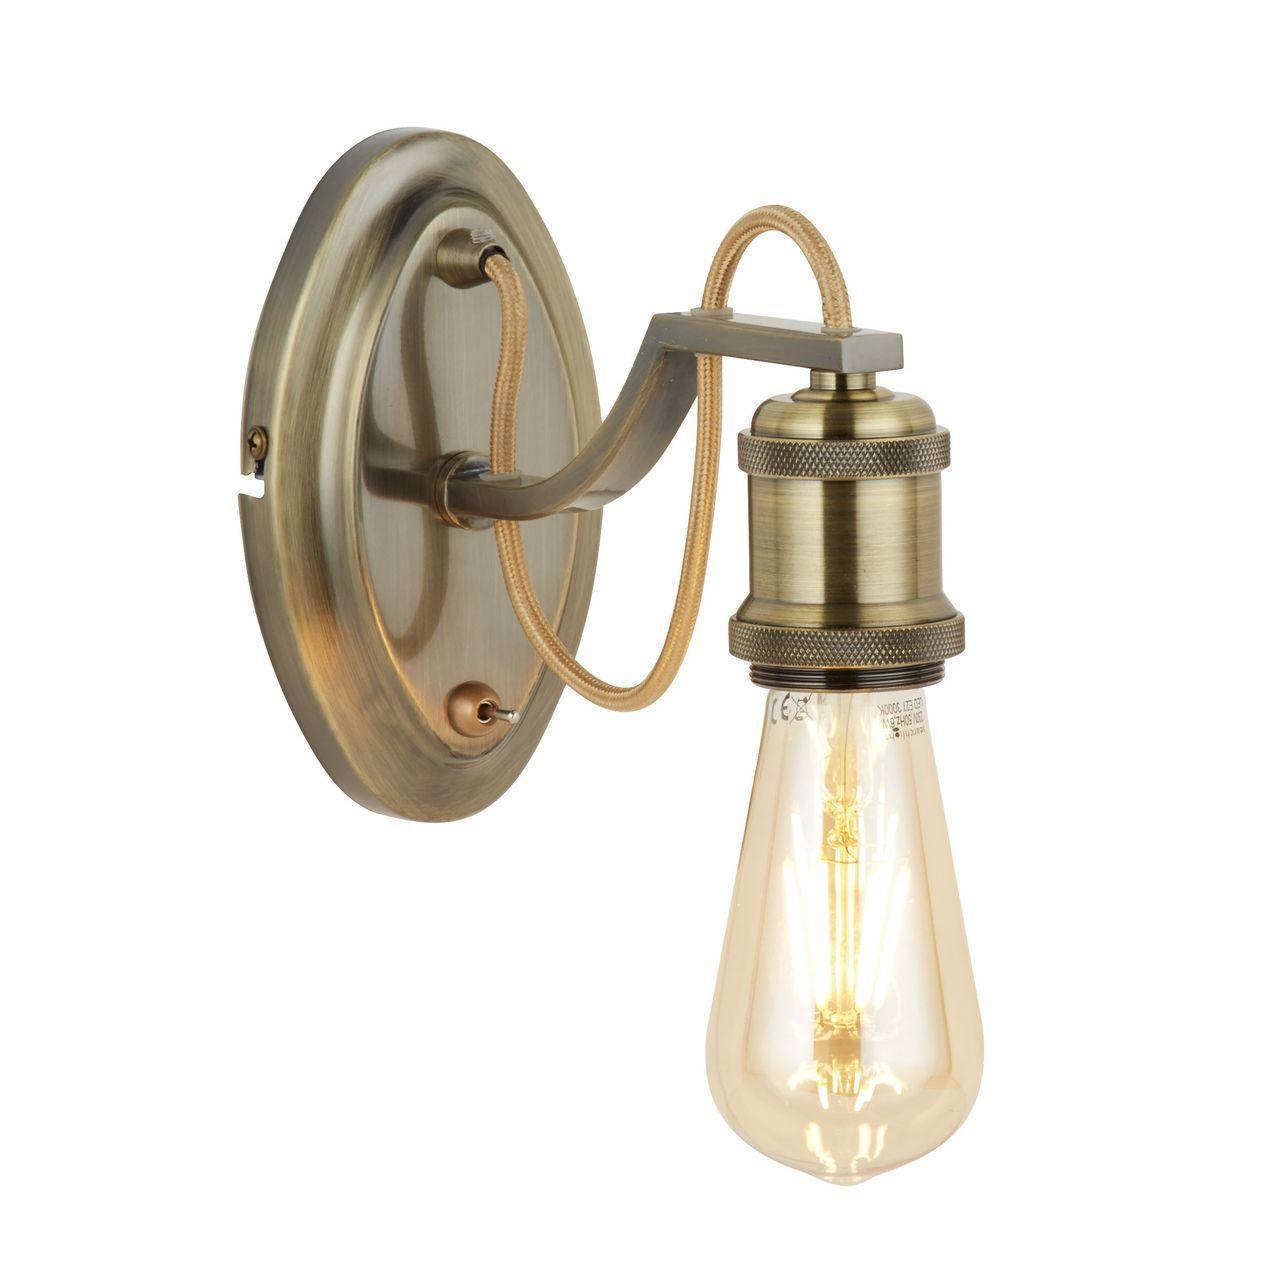 Бра Arte Lamp Inedito A2985AP-1AB бра arte lamp a2985ap 1ab